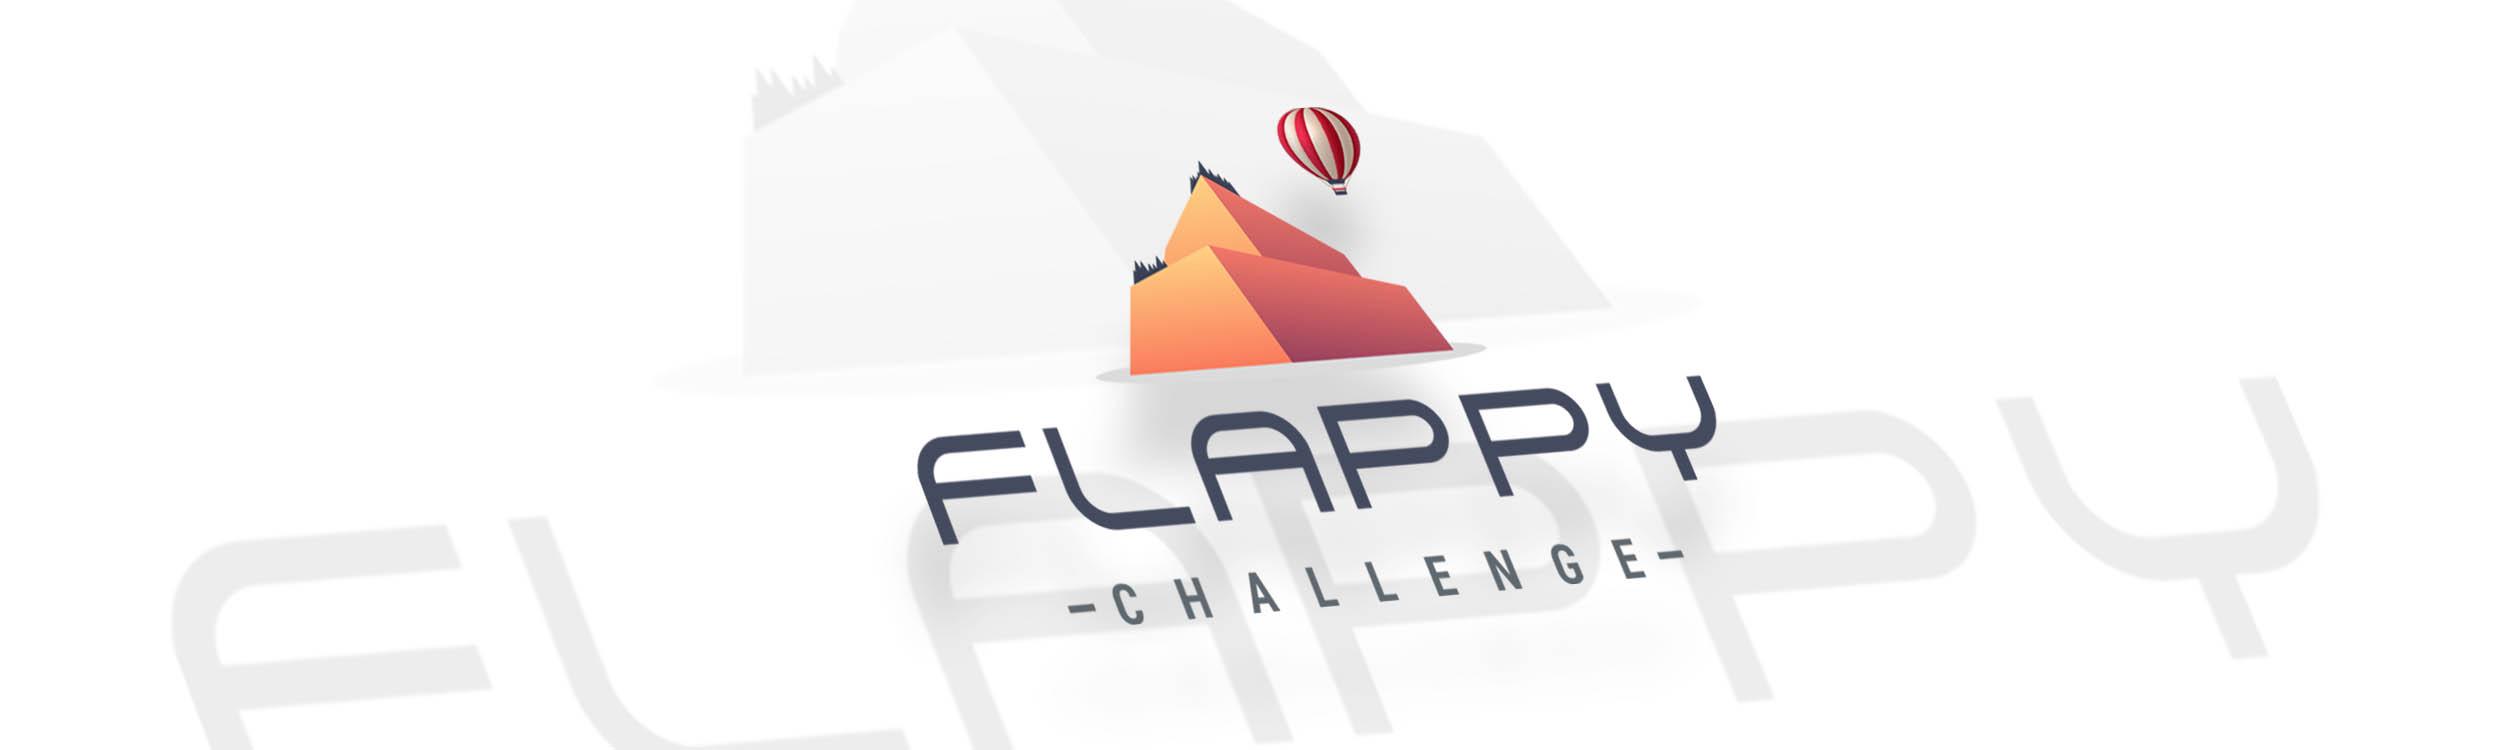 pixels logo flappy challenge big